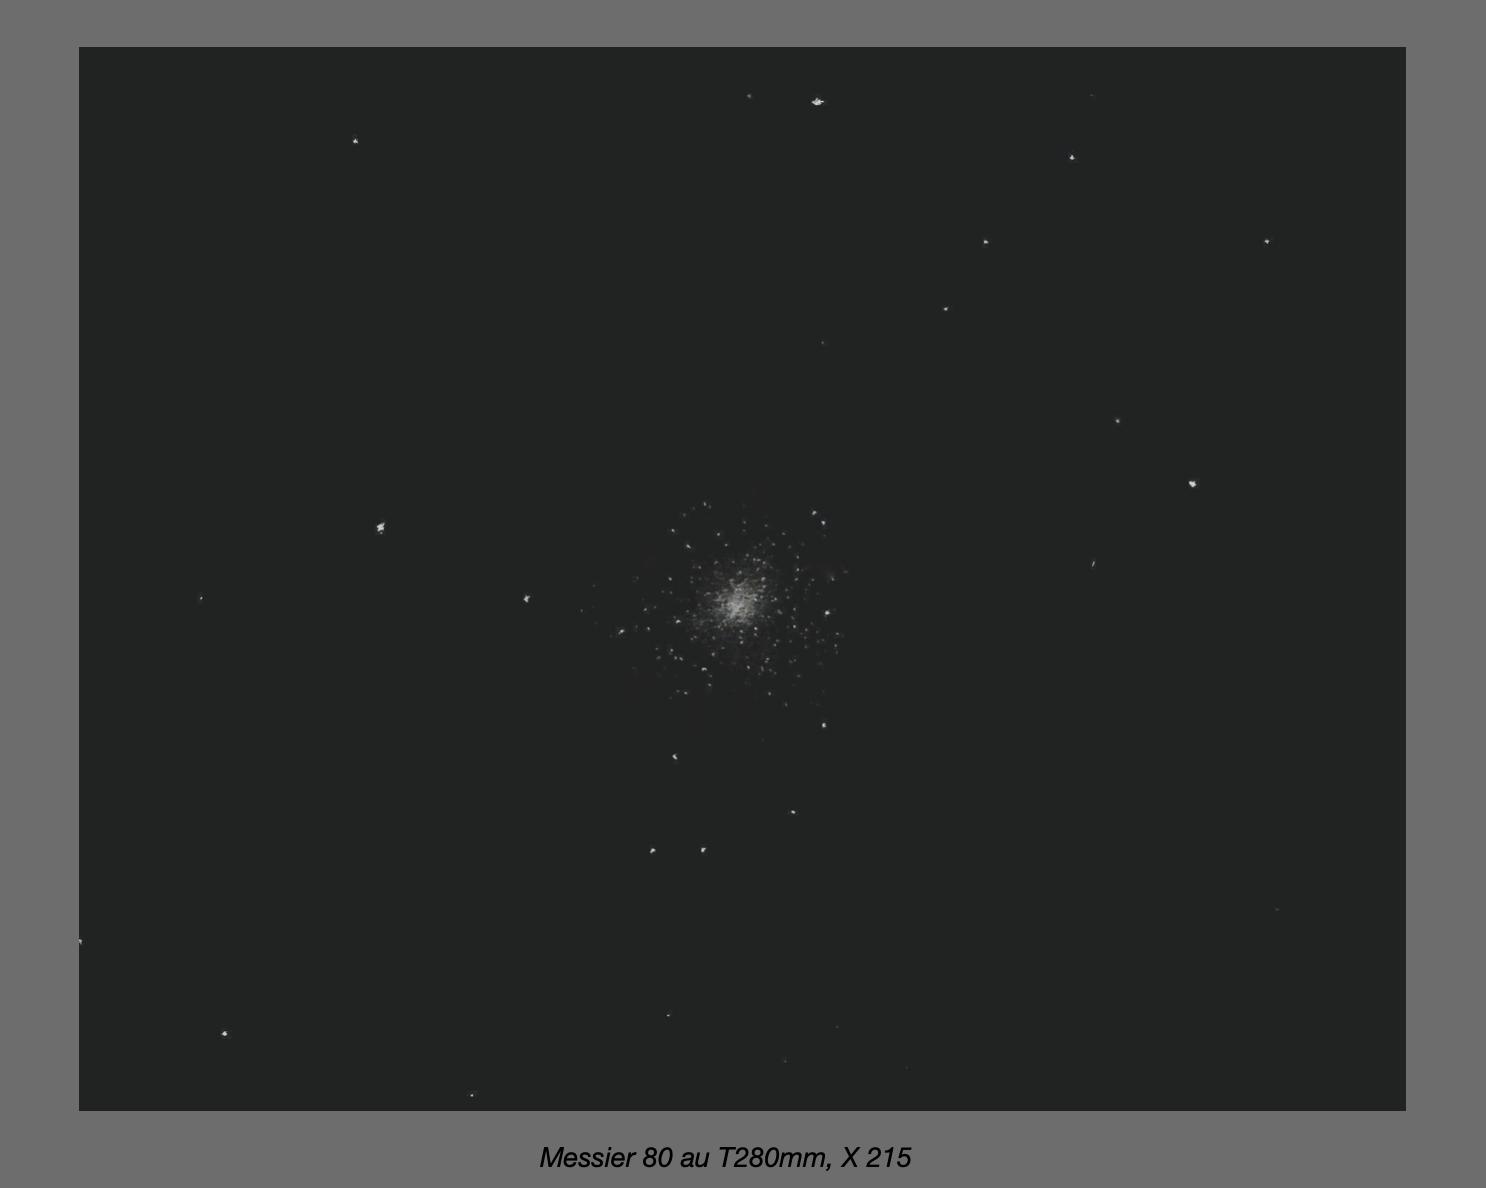 5ebacdbd74835_Messier80auT280mm.png.1cd2311fdc776f974644f3bf47db686e.png